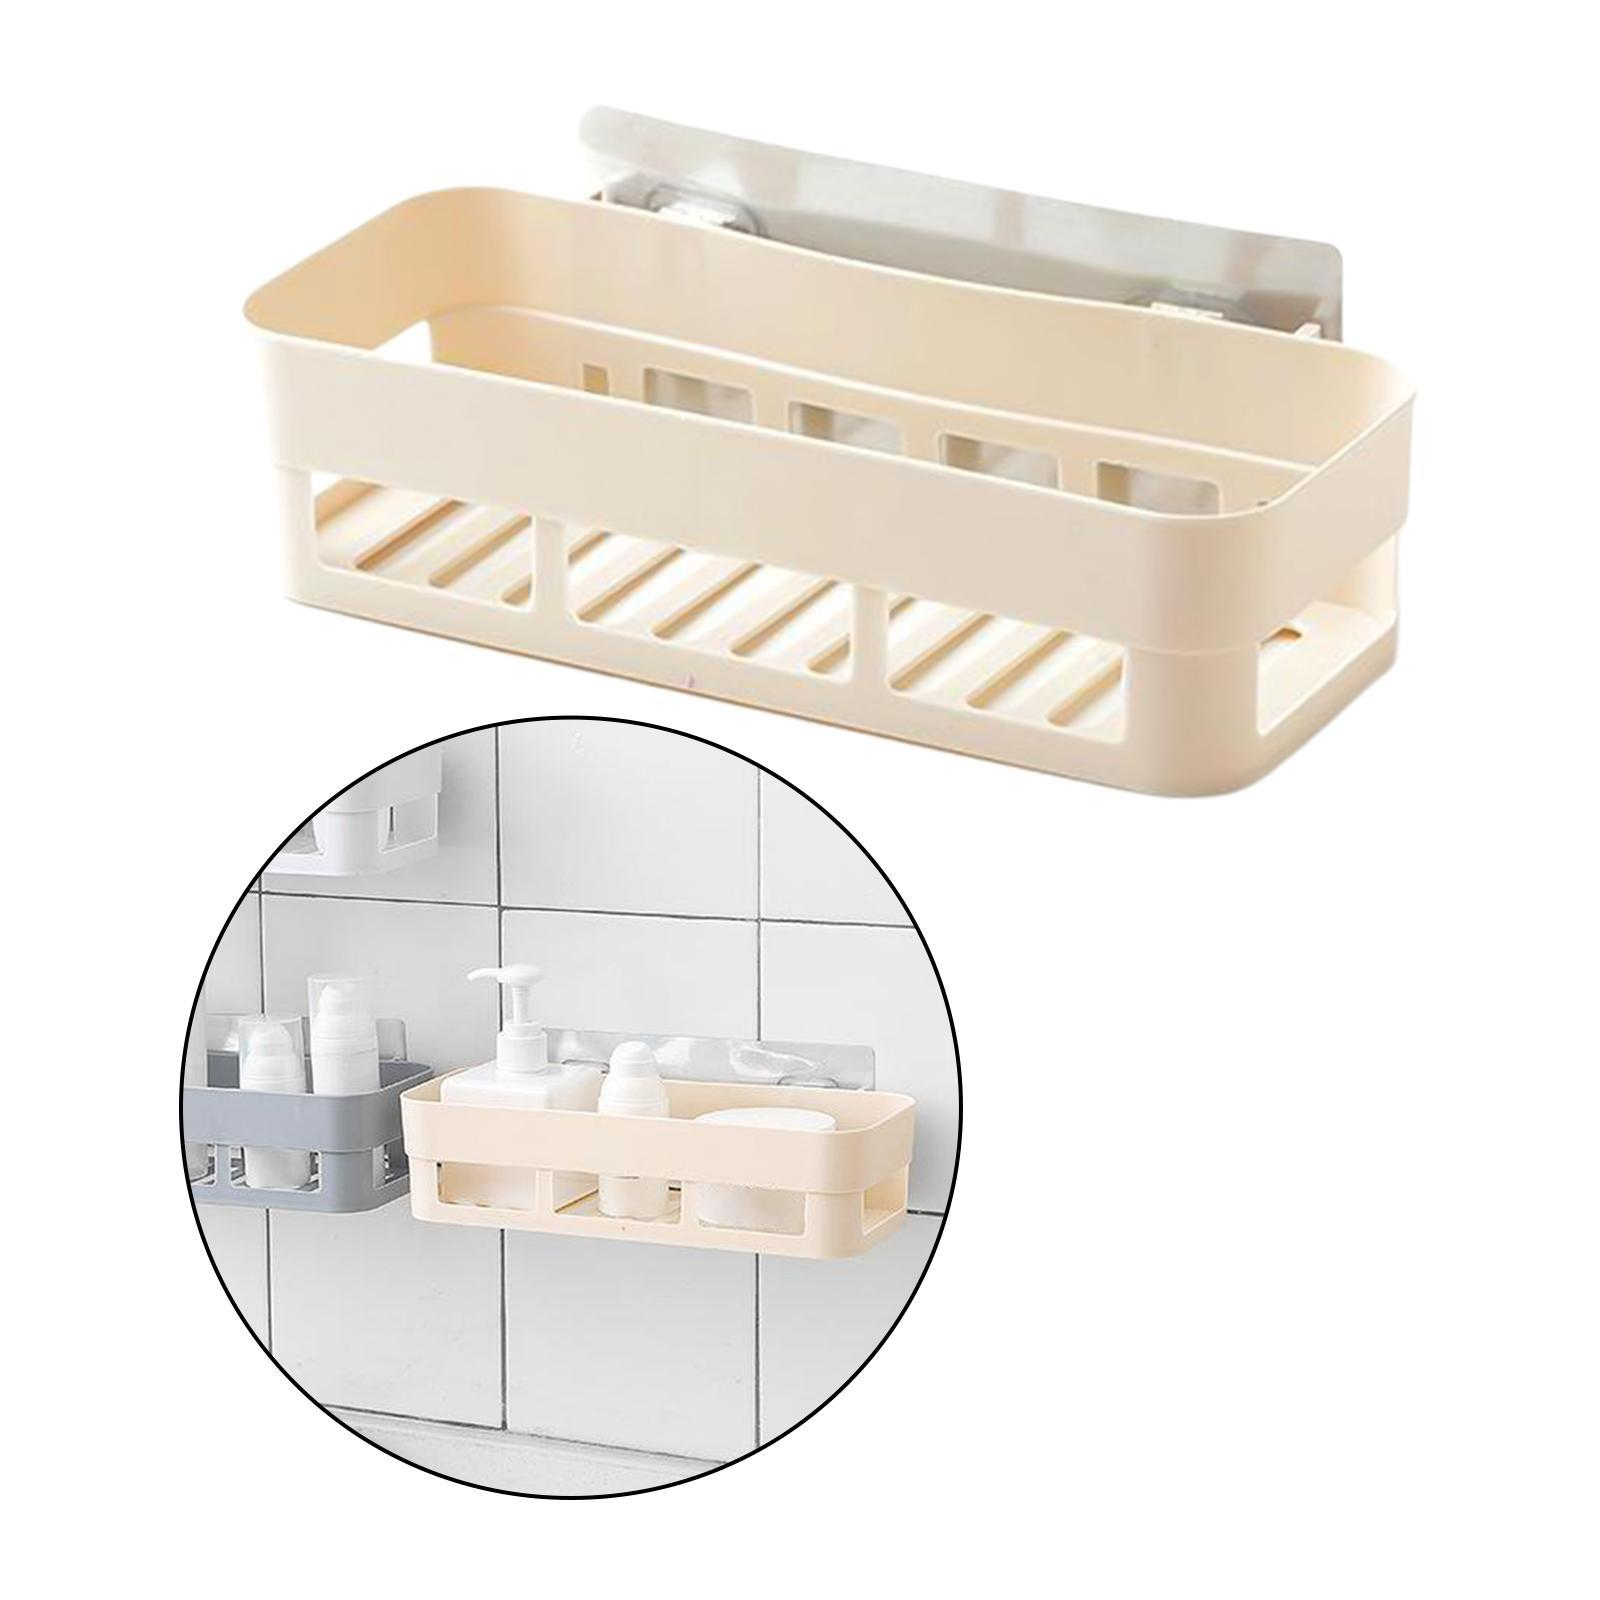 thumbnail 21 - Wall-Suction-Bathroom-Shelf-Shower-Caddy-Wall-Mount-Storage-Rack-Organizer